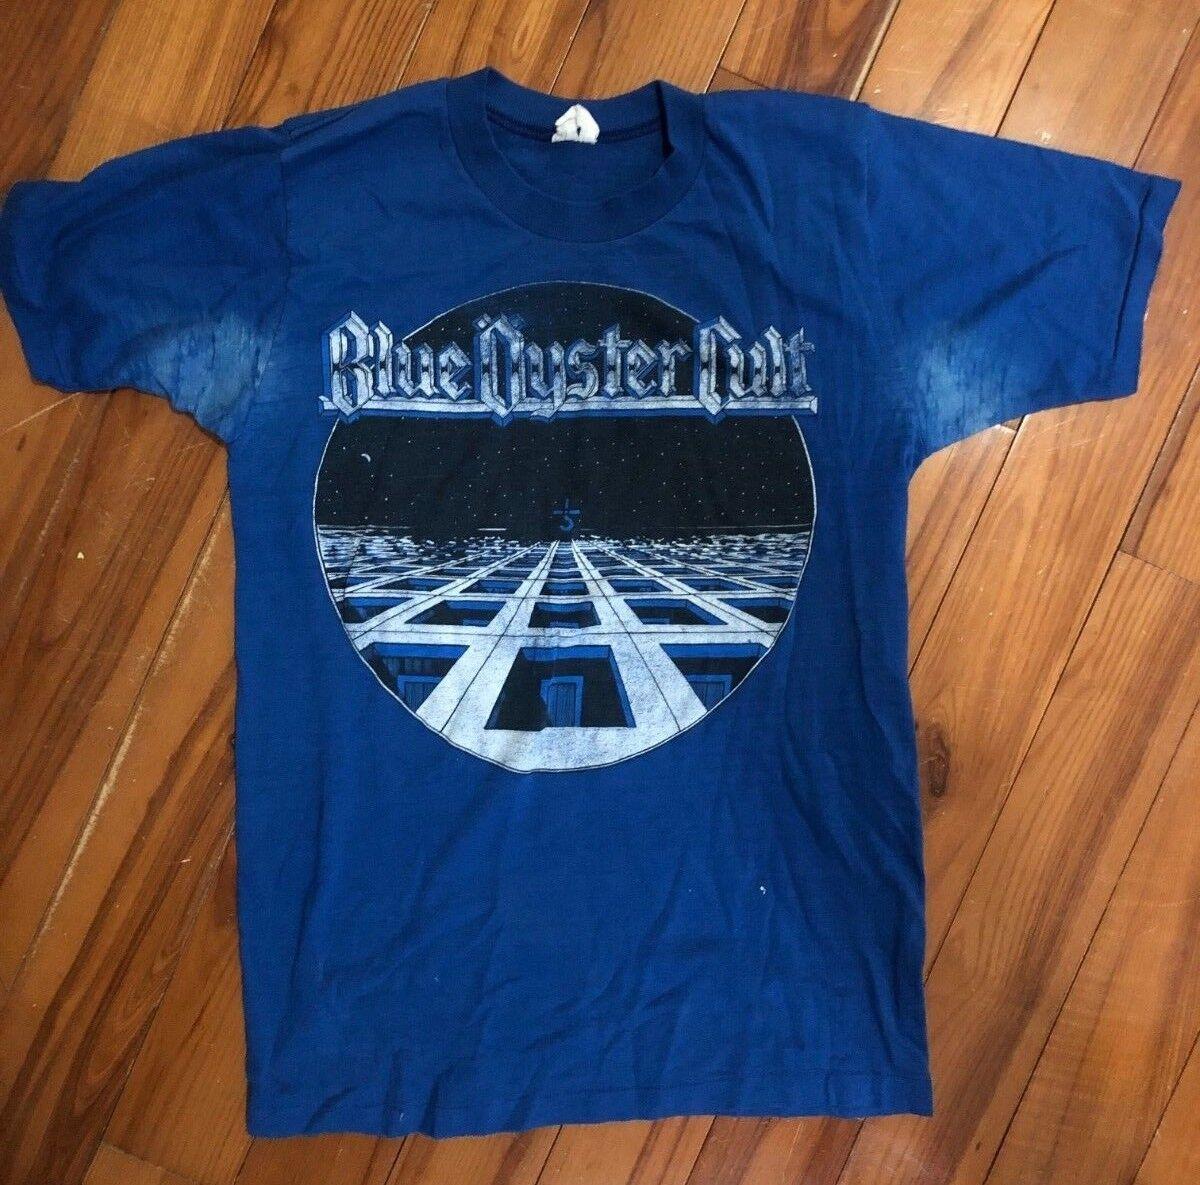 Blau Oyster Cult Super Soft Vintage hemd   SZ SM